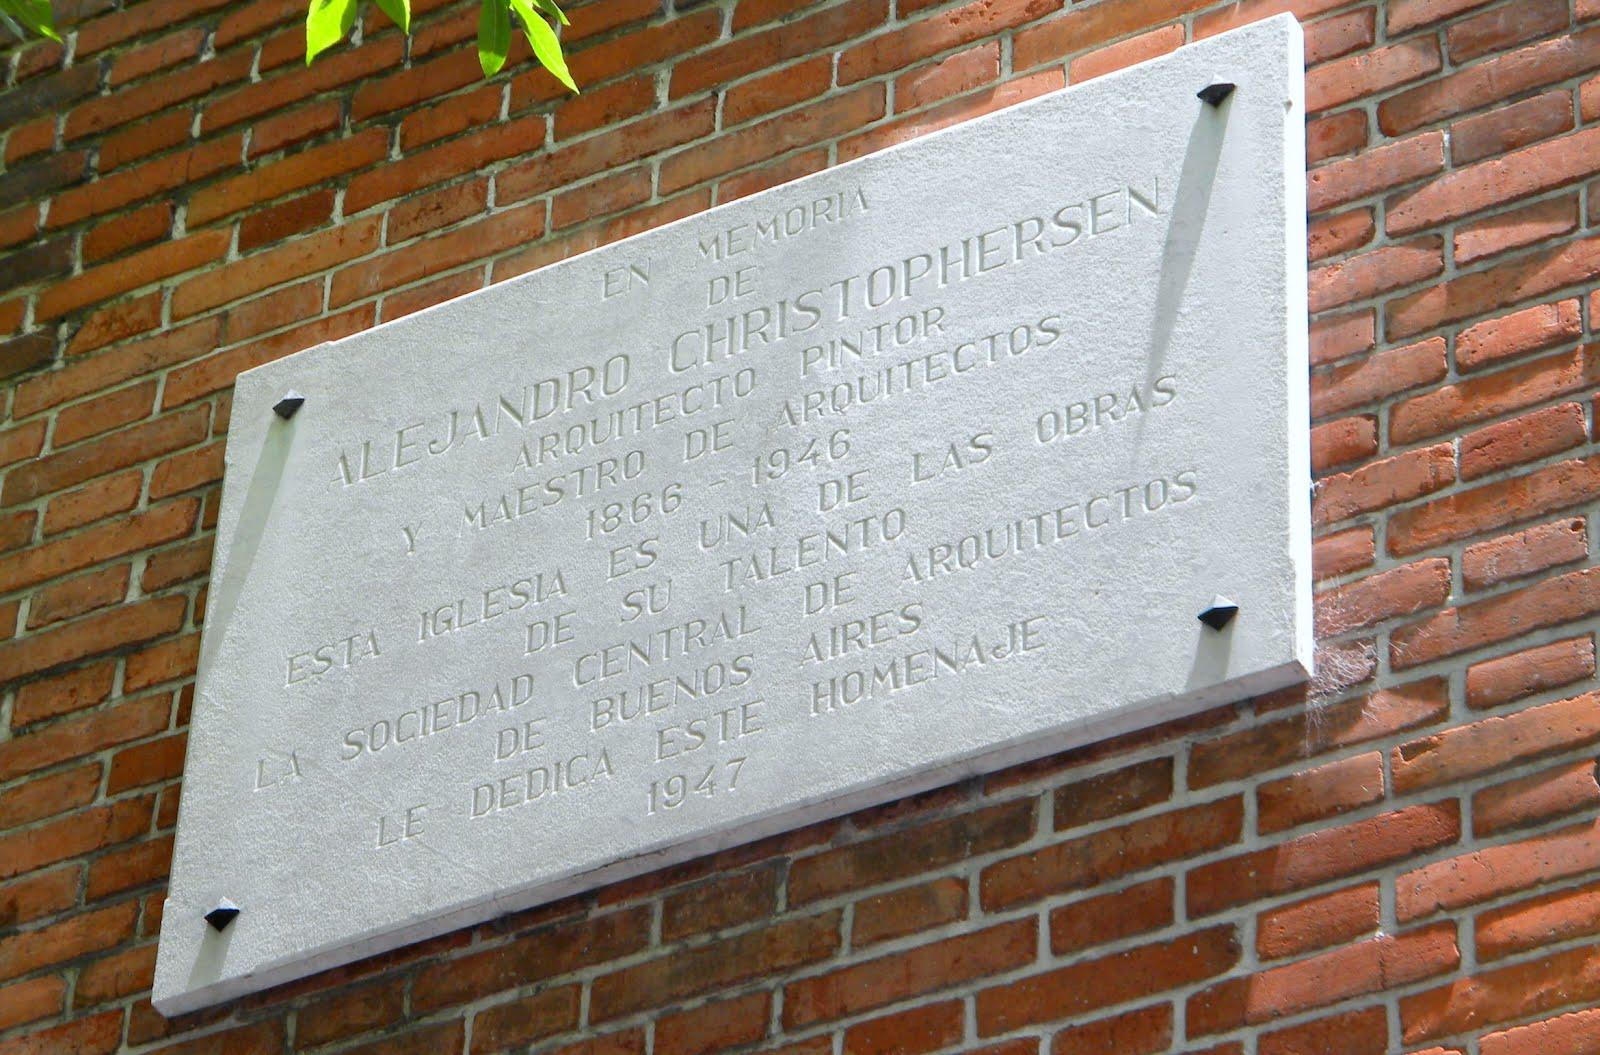 Homenaje al arq alejandro christophersen cat logo on line de su obra pasco 435 iglesia - Sociedad de arquitectos ...